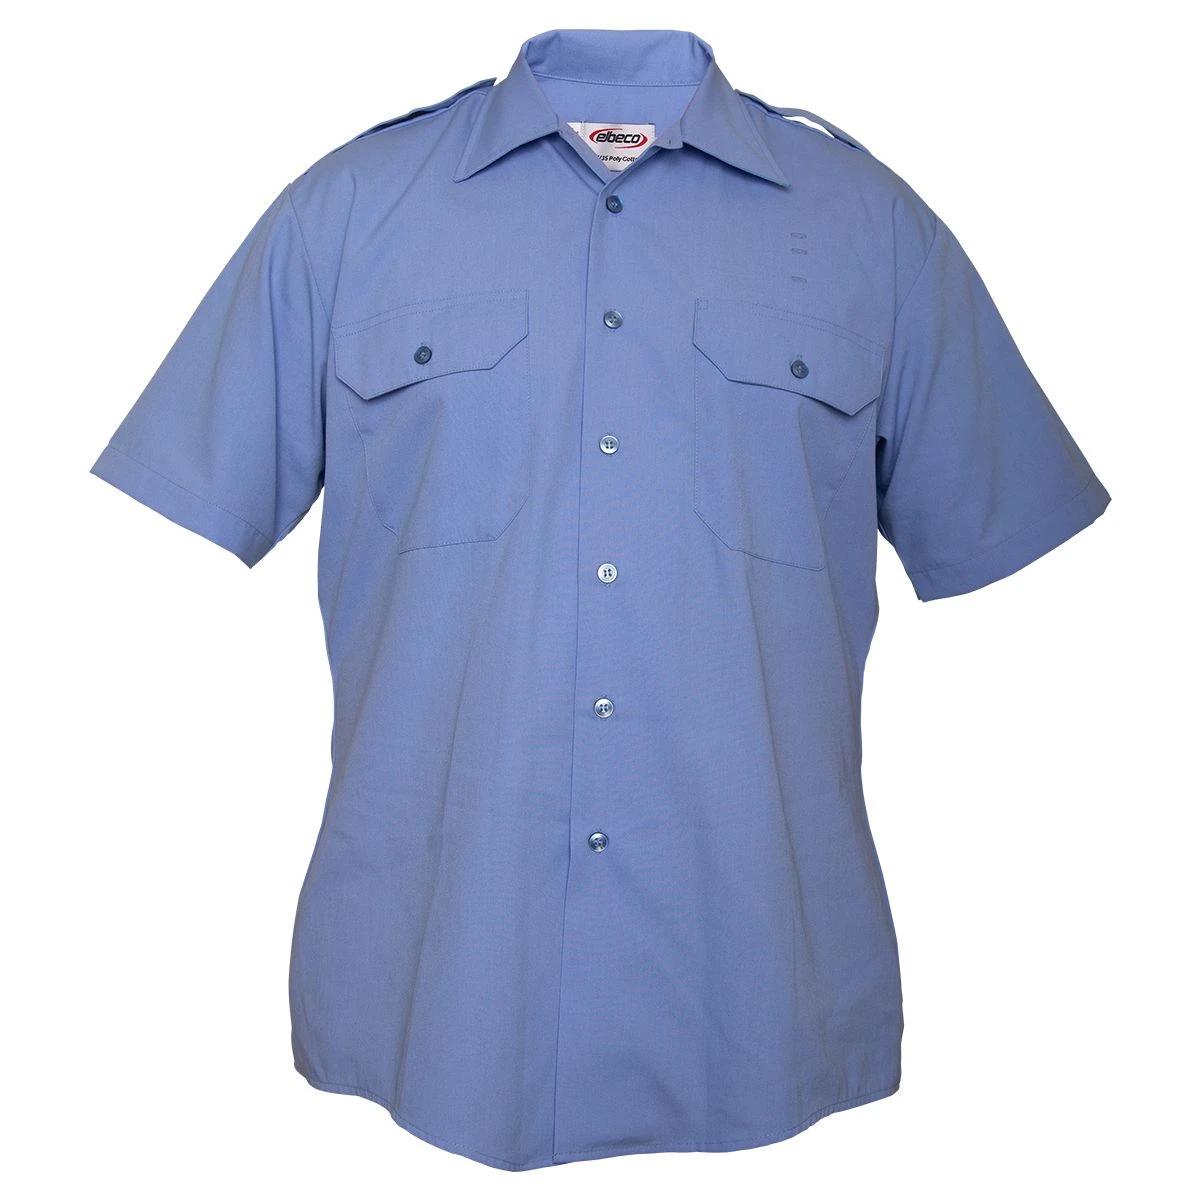 Elbeco First Responder Short Sleeve Shirt